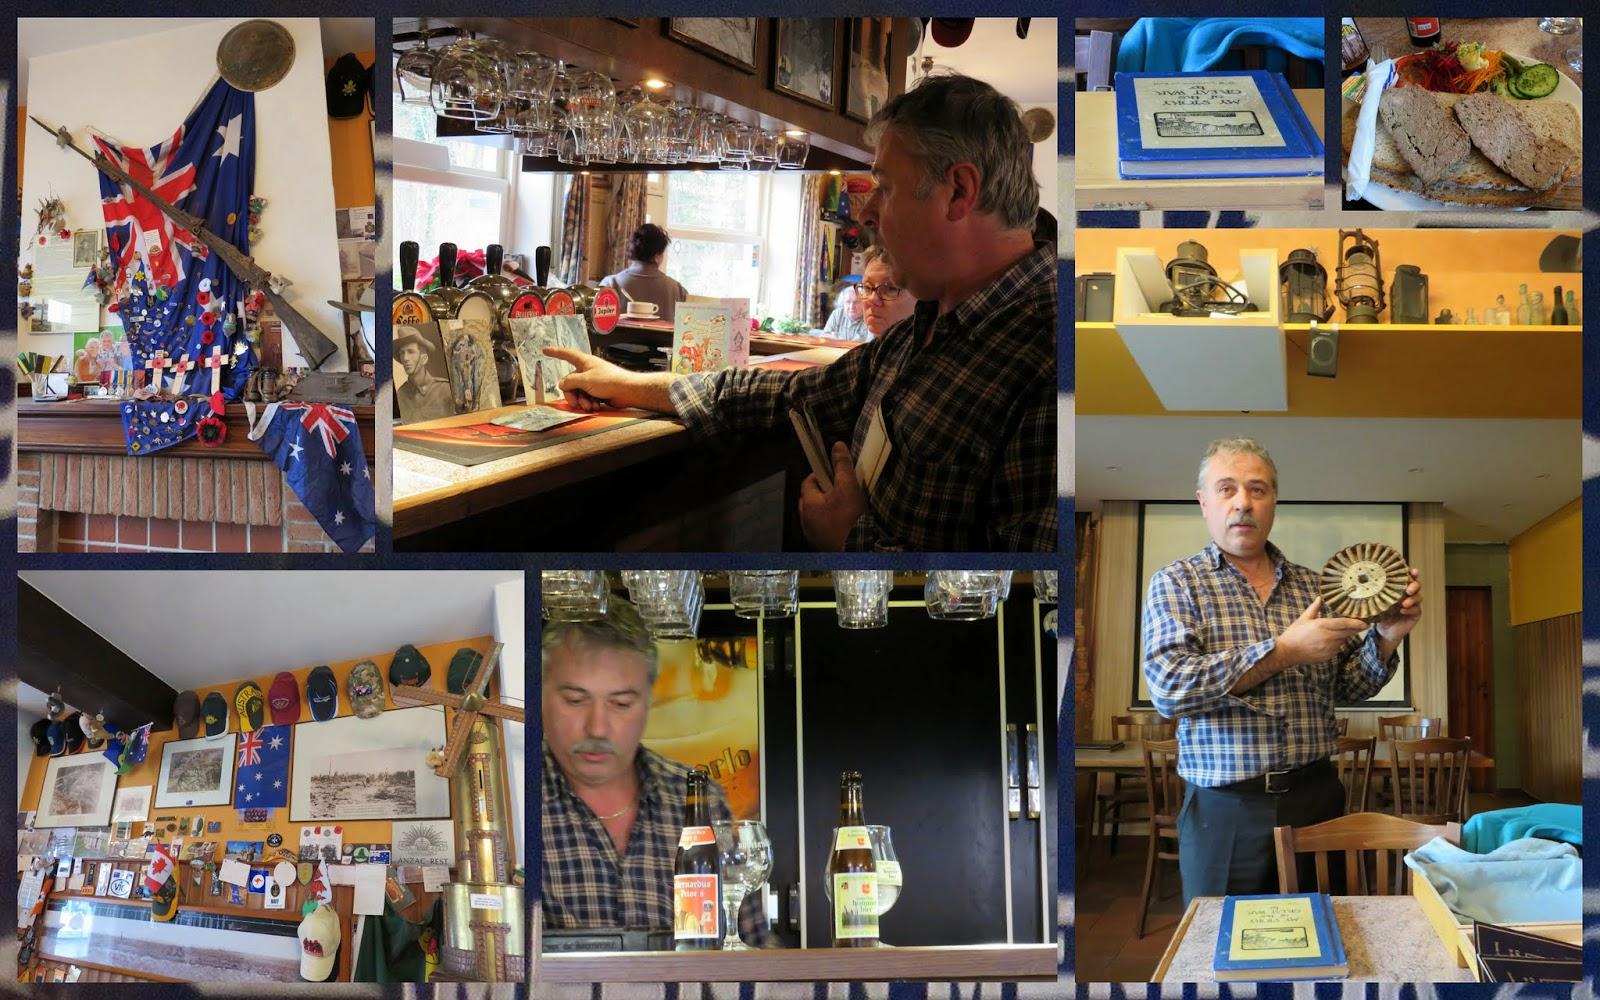 Johan Vandewalle - Cafe Taverne de Dreve in Flanders